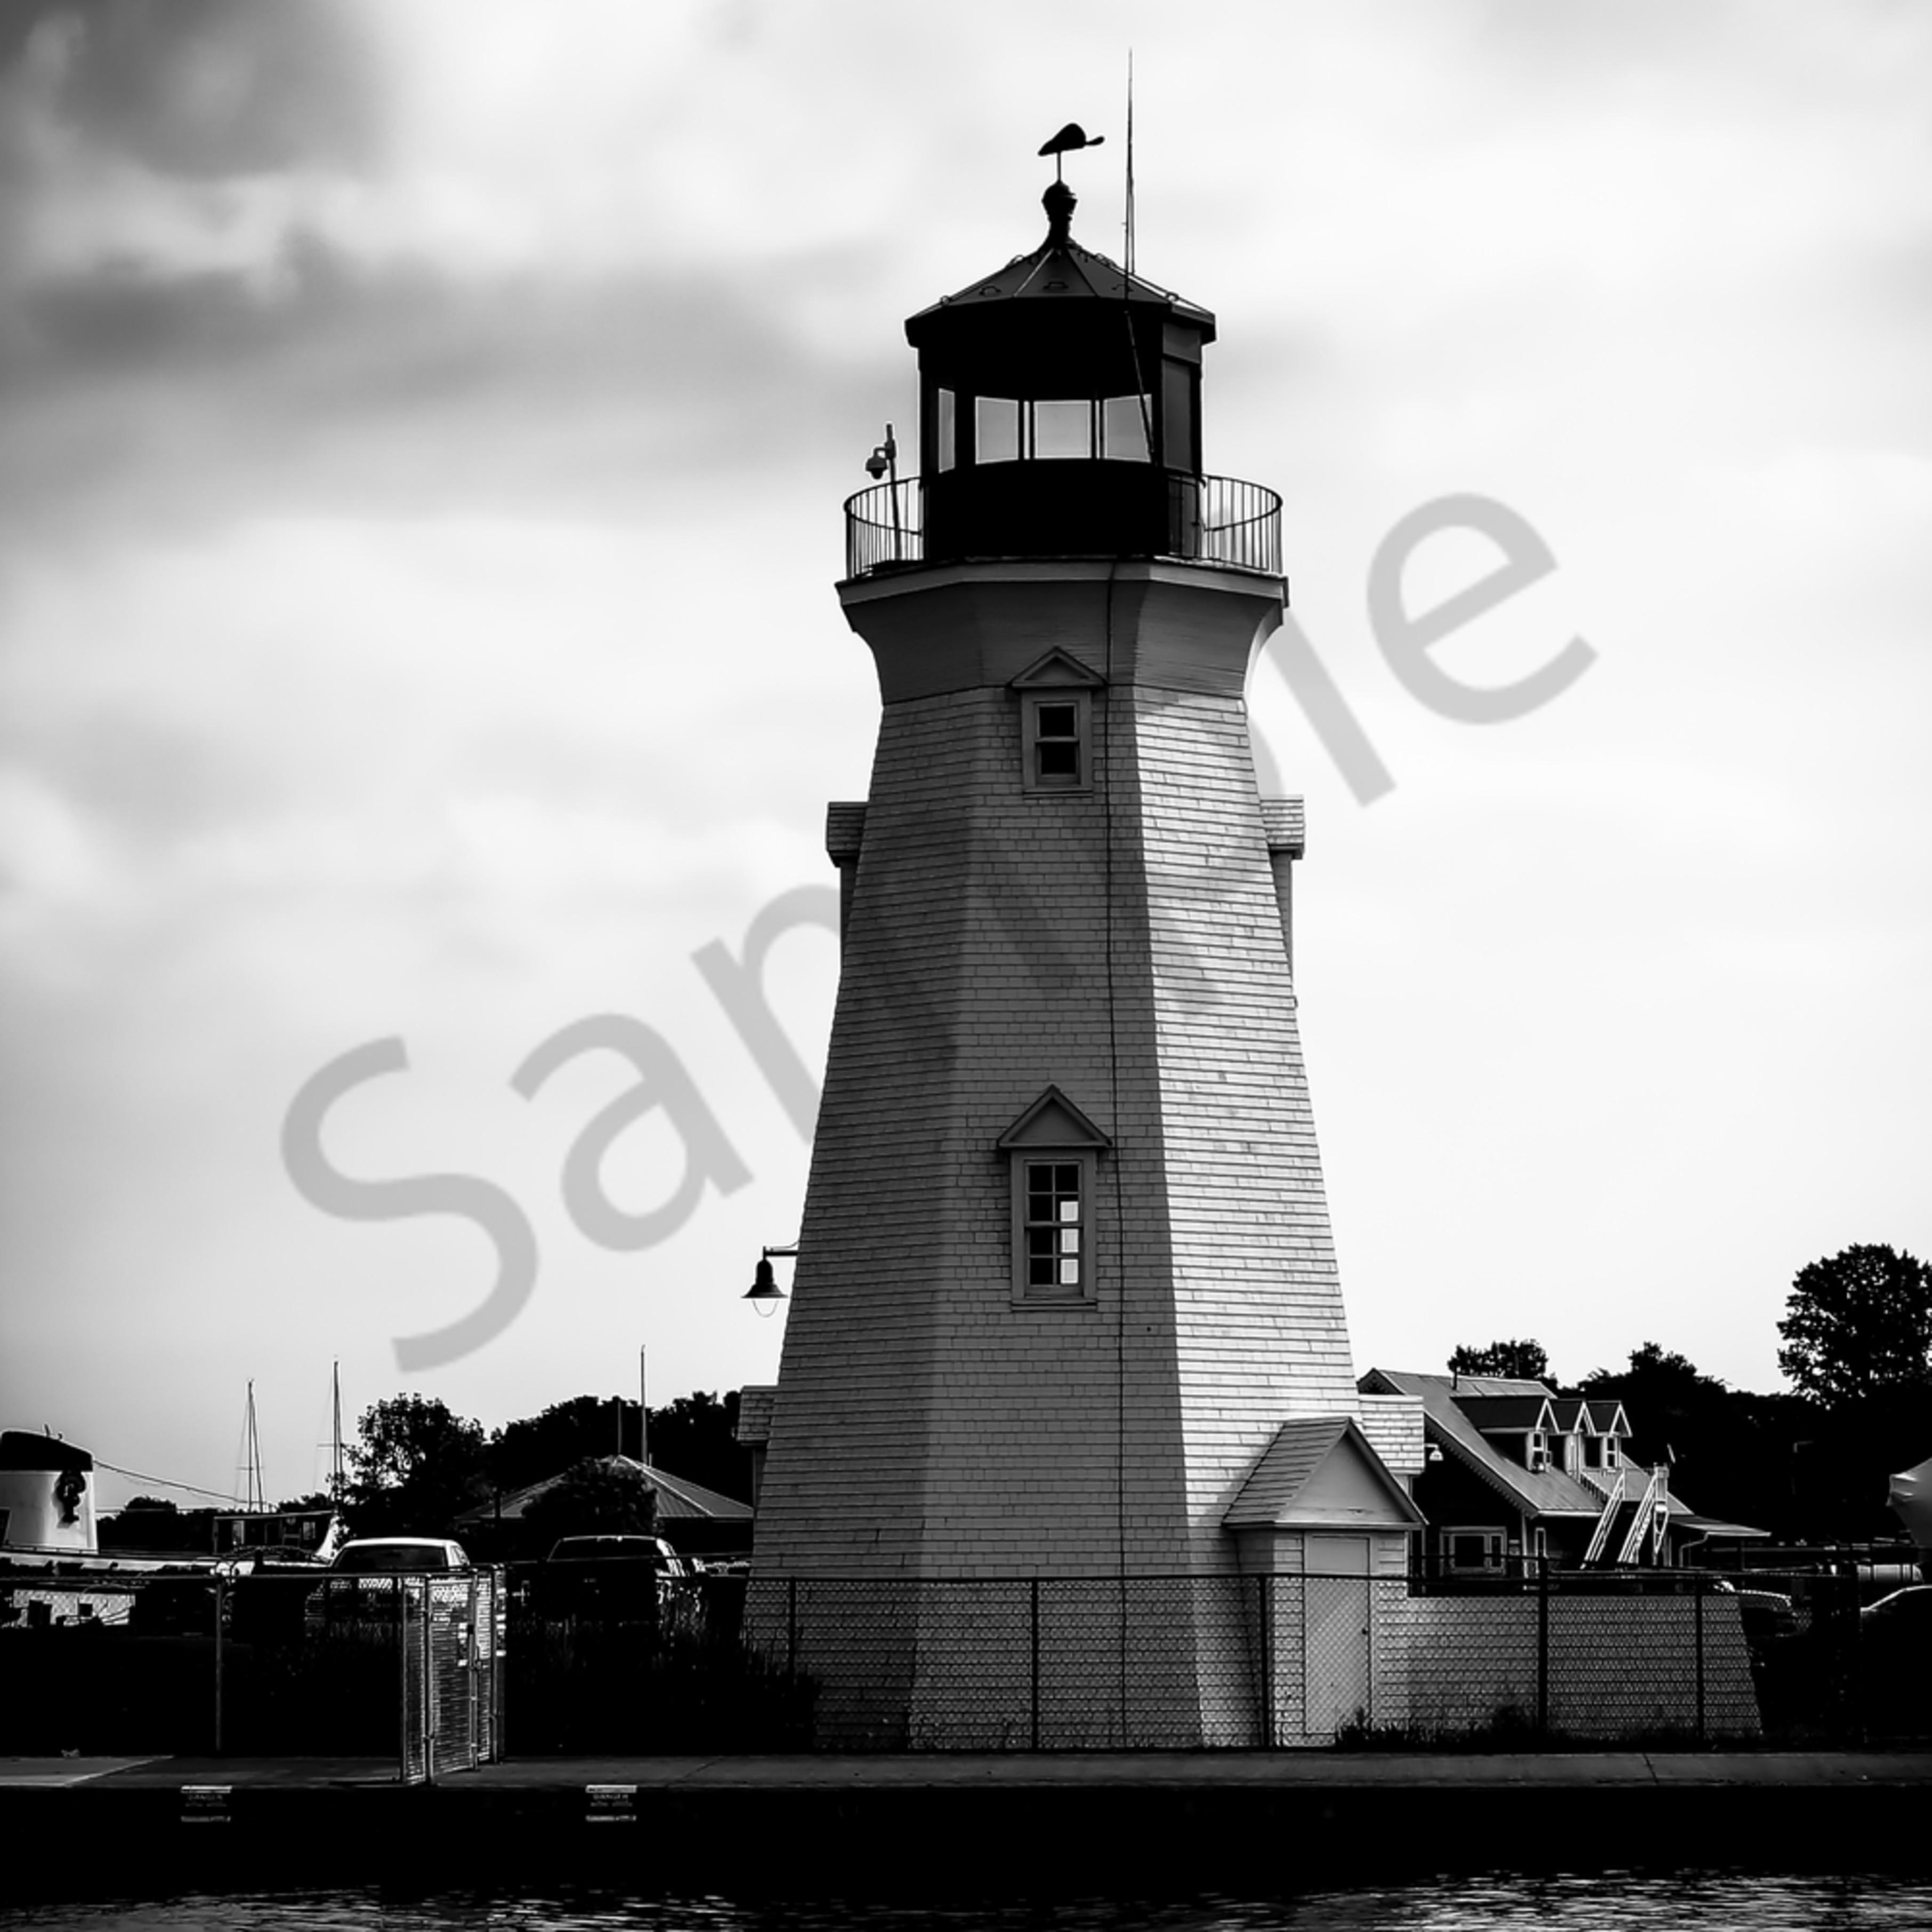 Lighthouse on the pier xogfs1